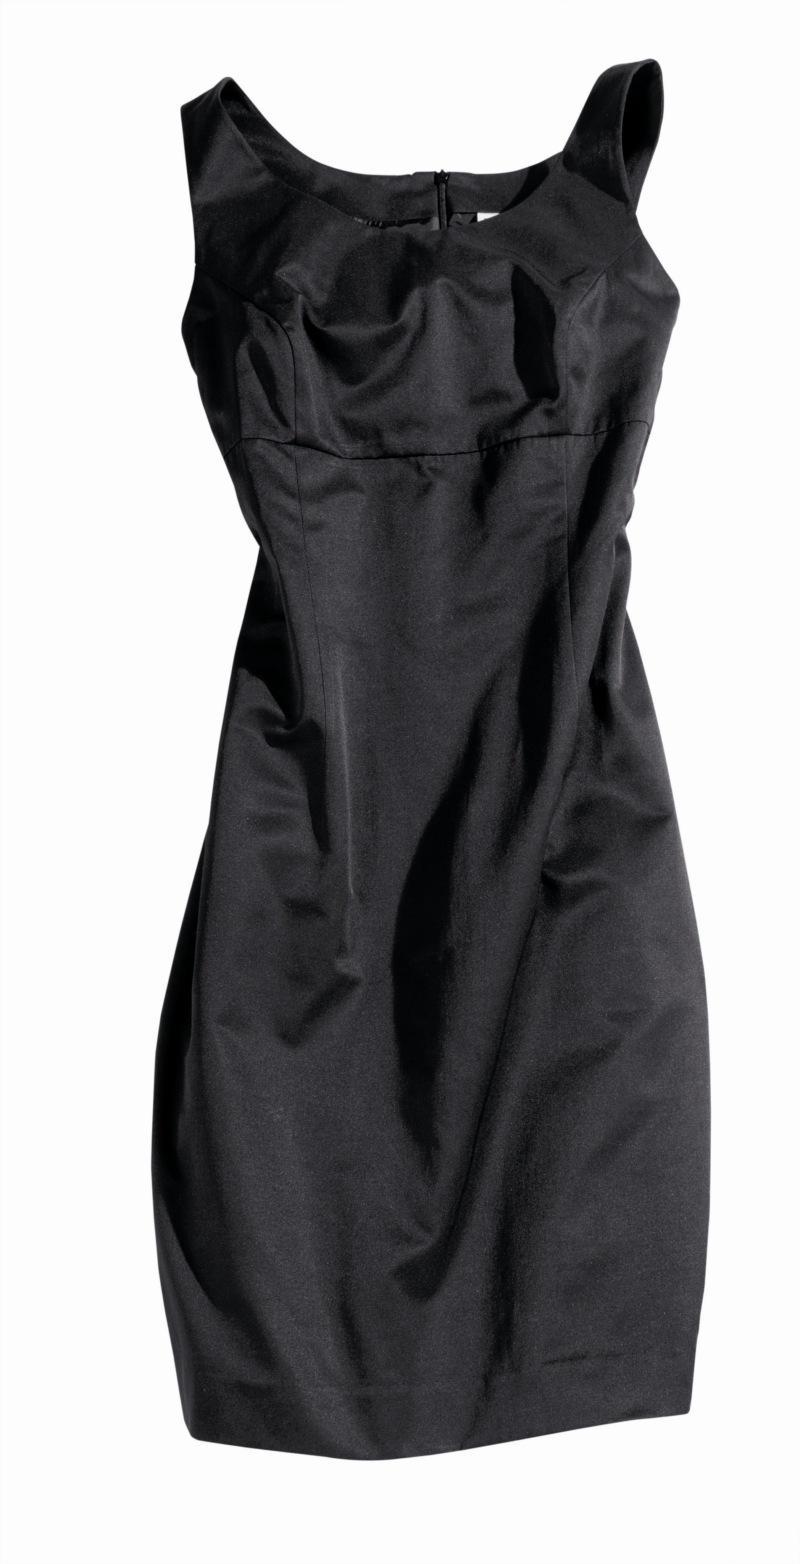 czarna sukienka Charles Vögele - moda wiosna/lato